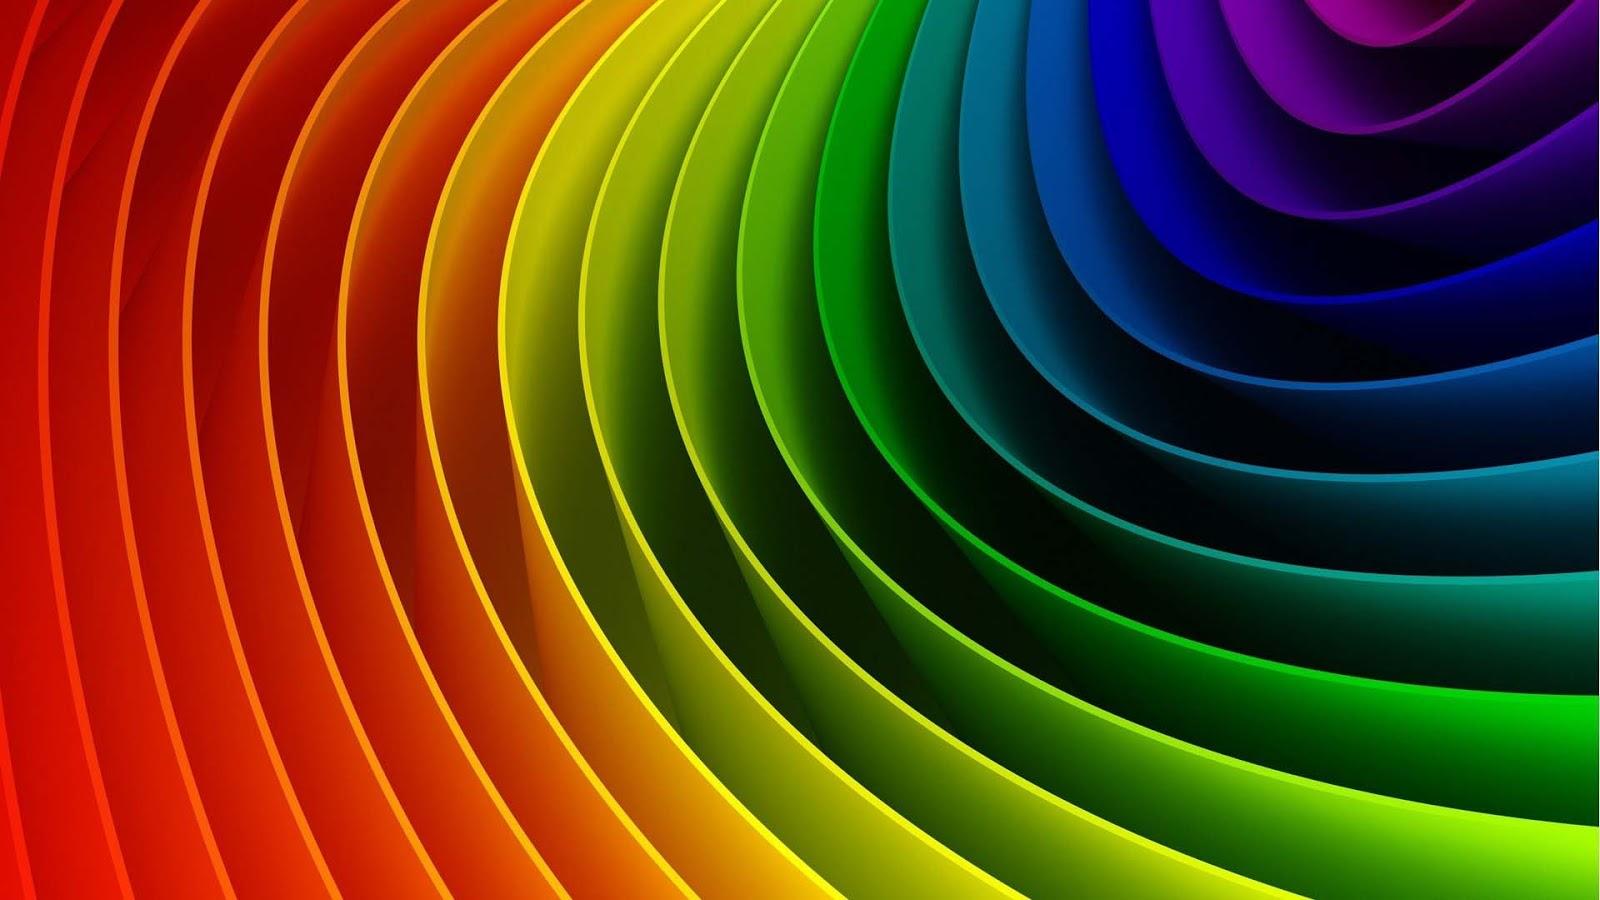 Rainbow Wallpaper Desktop: Free Wallpicz: Wallpaper Desktop Rainbow